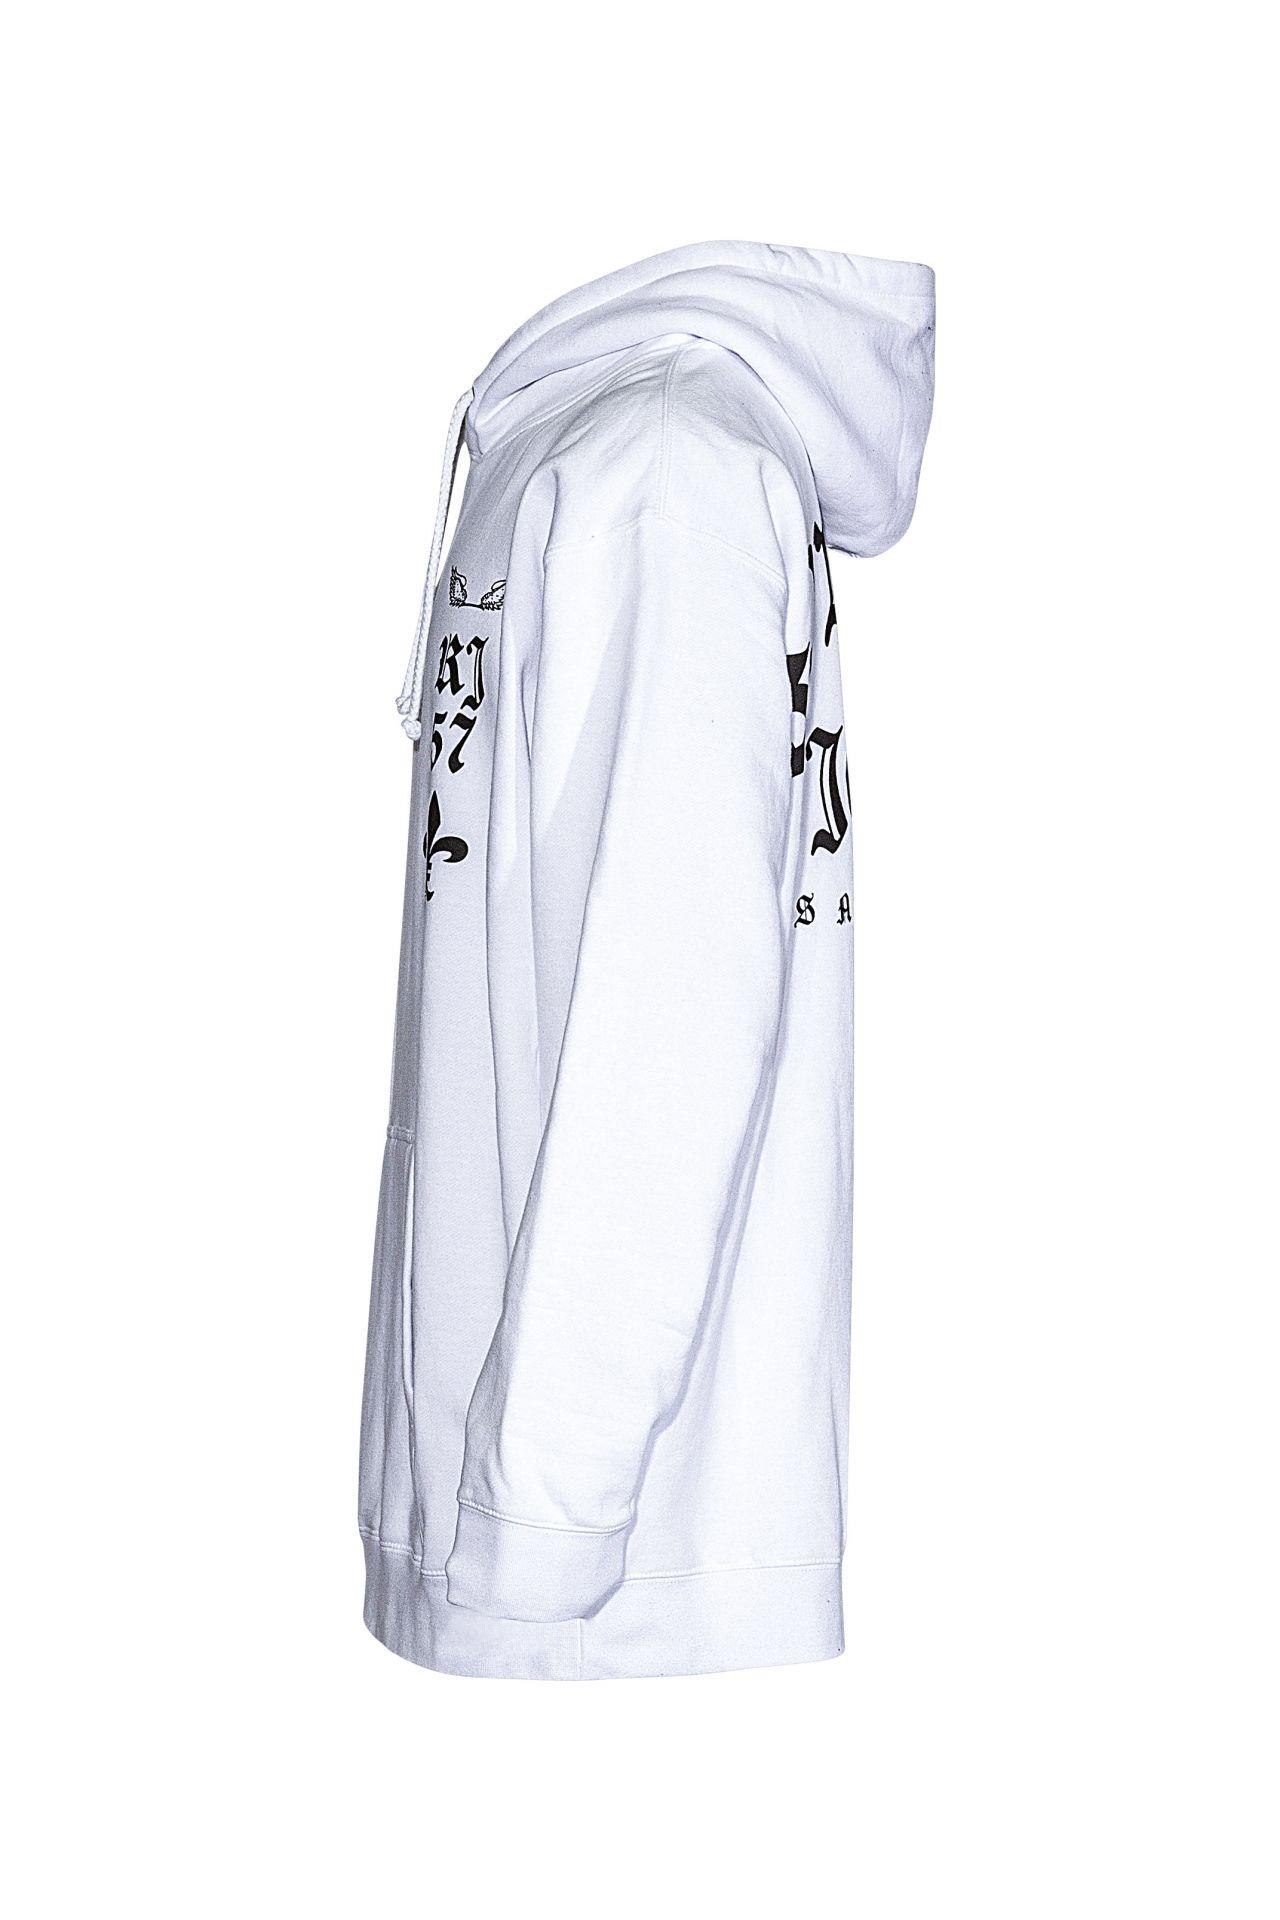 FLEUR-DE-LIS HOODIE IN WHITE